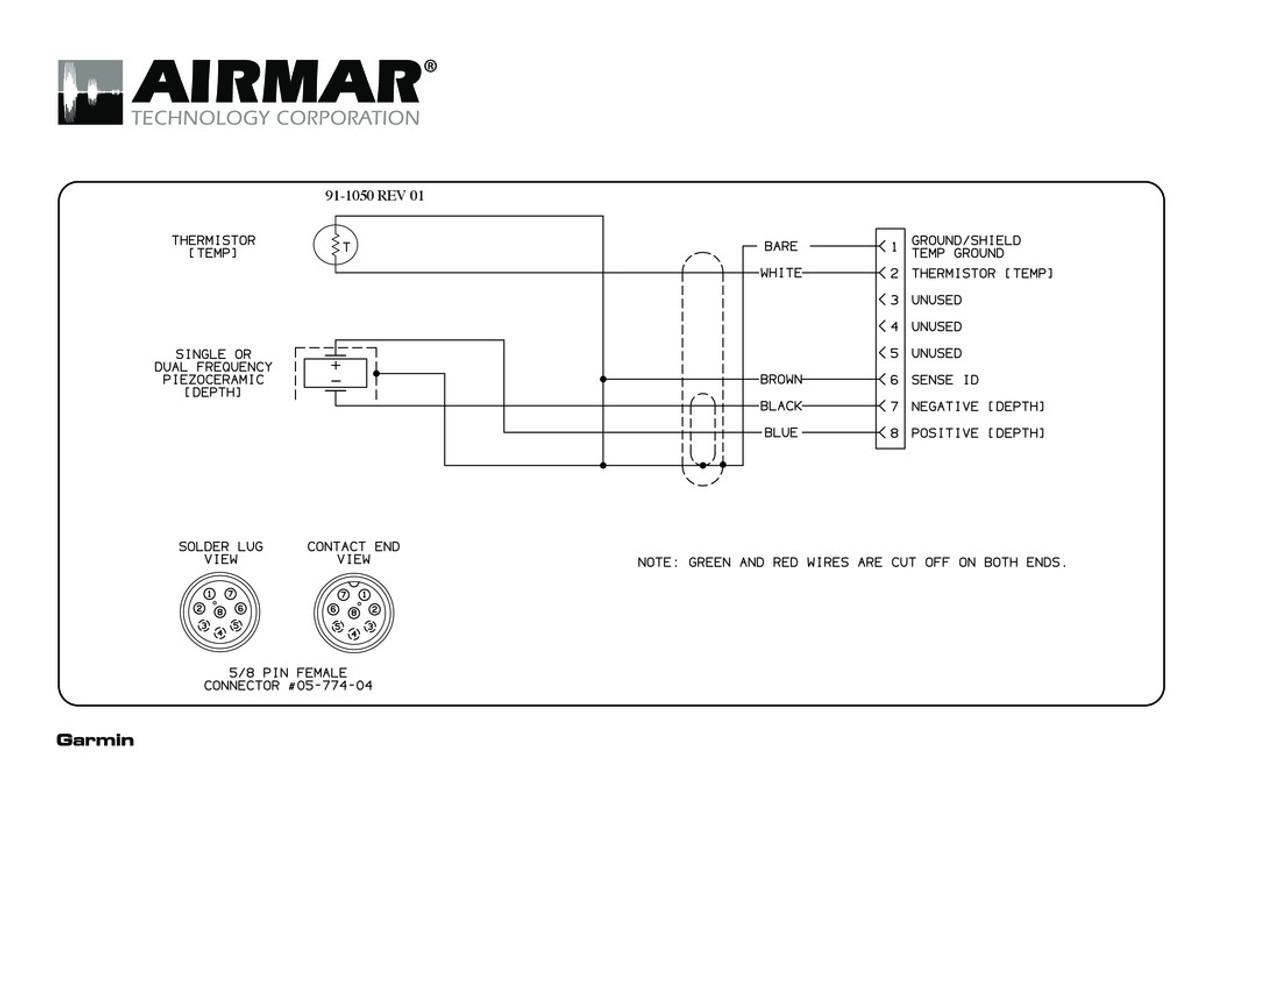 small resolution of  garmin 17 gps wiring diagram wiring diagrams schematics garmin 3010c manual operator 18 5 wiring diagram